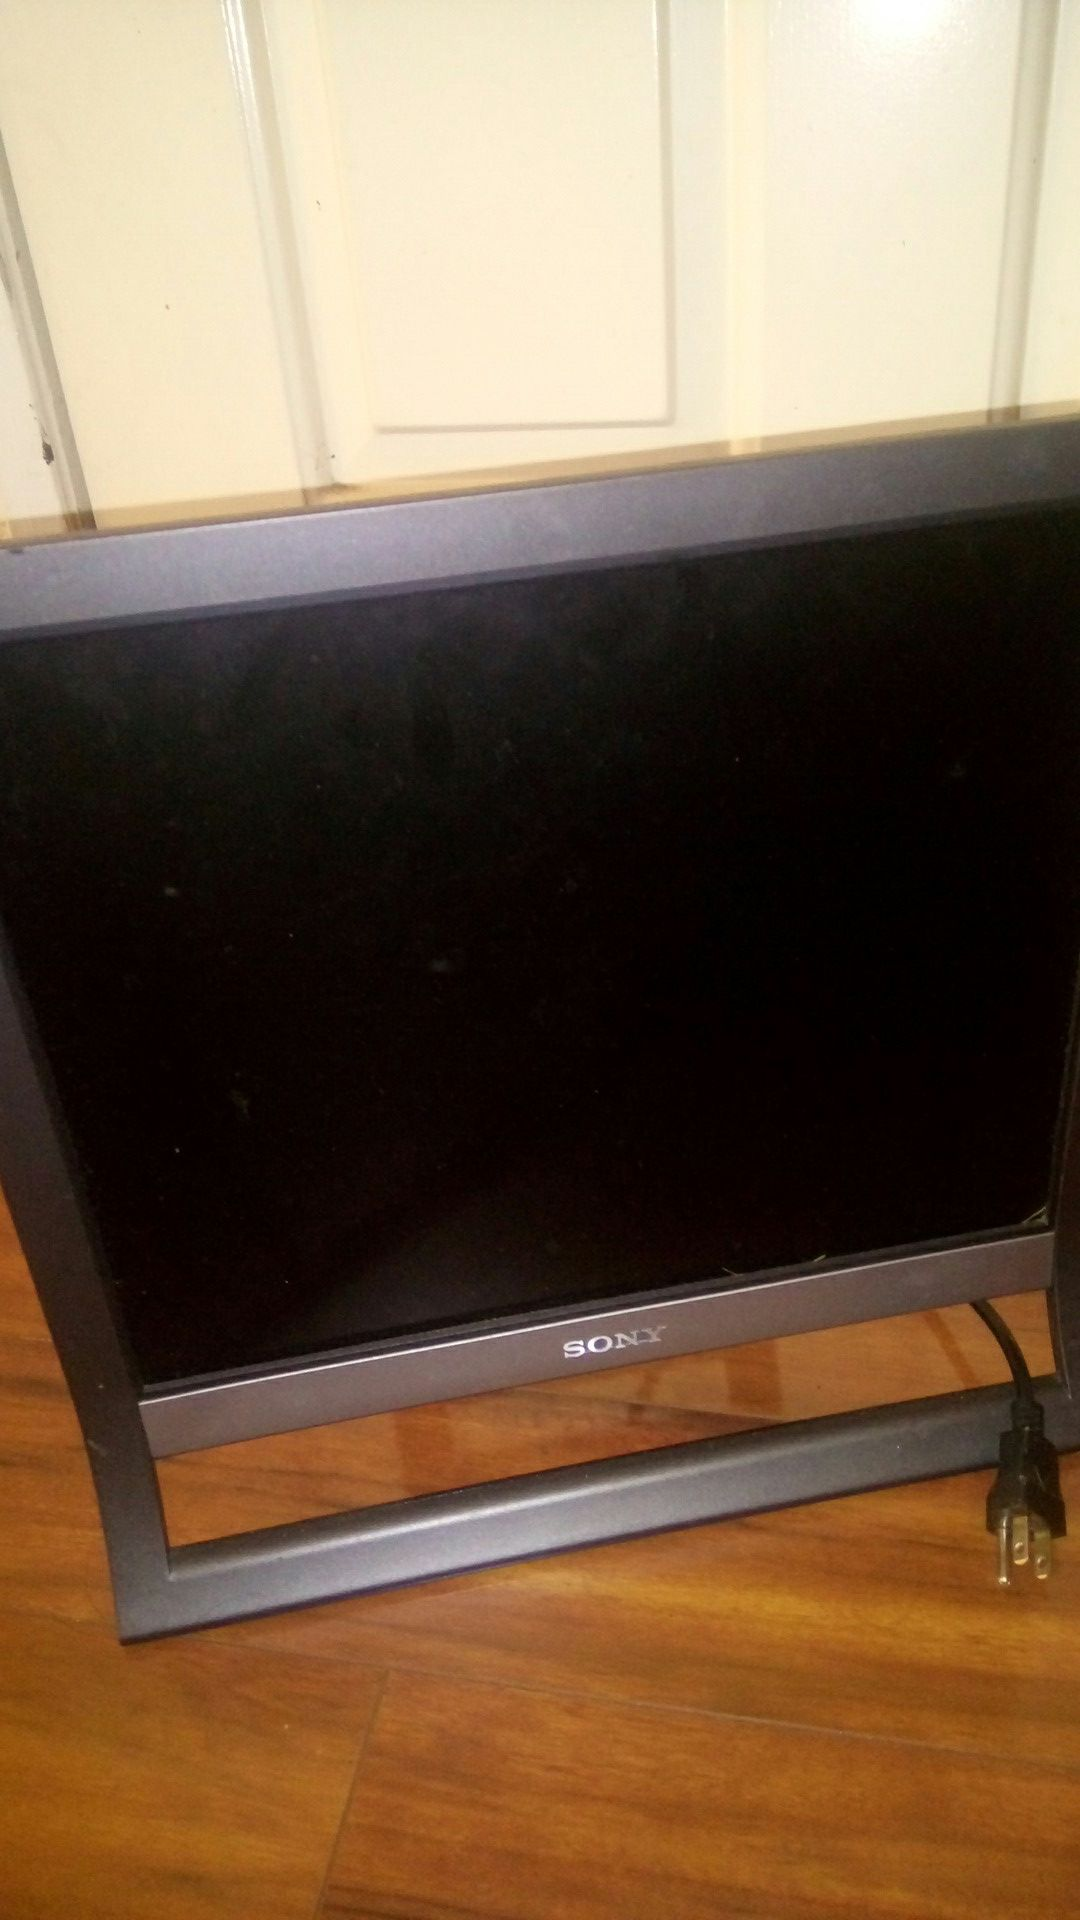 Sony 14 inch LCD monitor